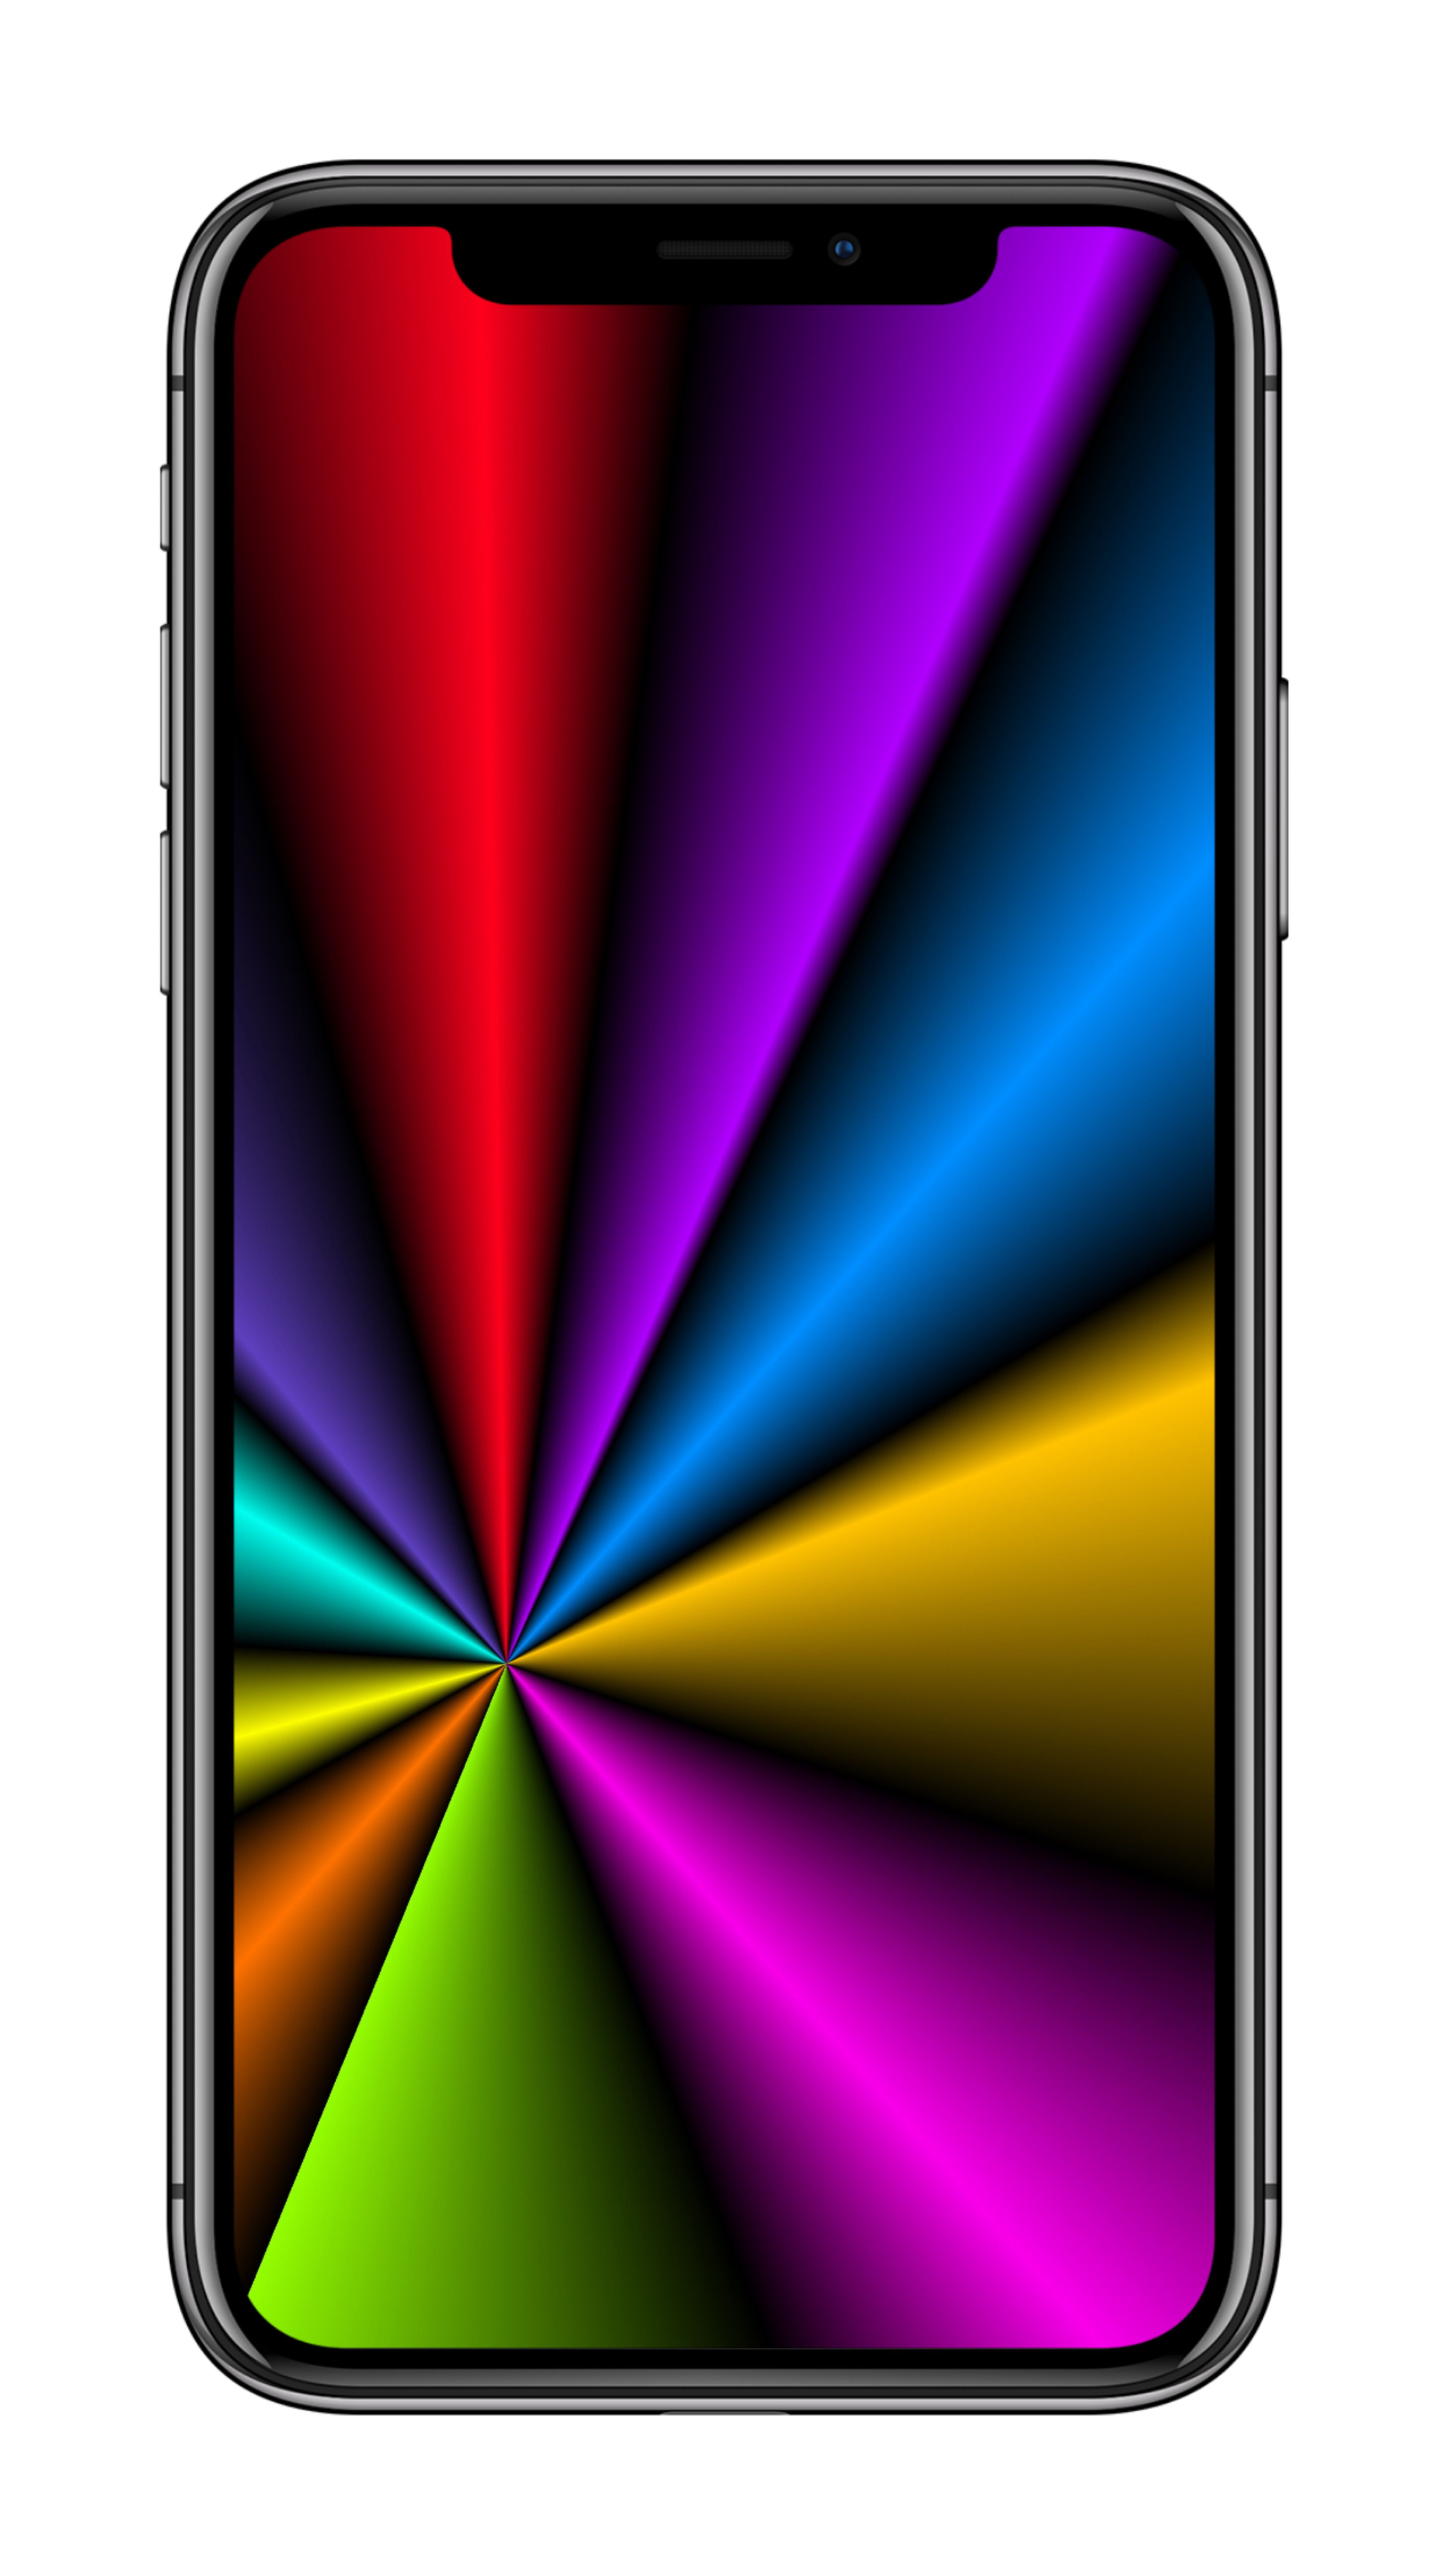 Phone Tablet Wallpaper Designed By C Hotspot4u Iphone